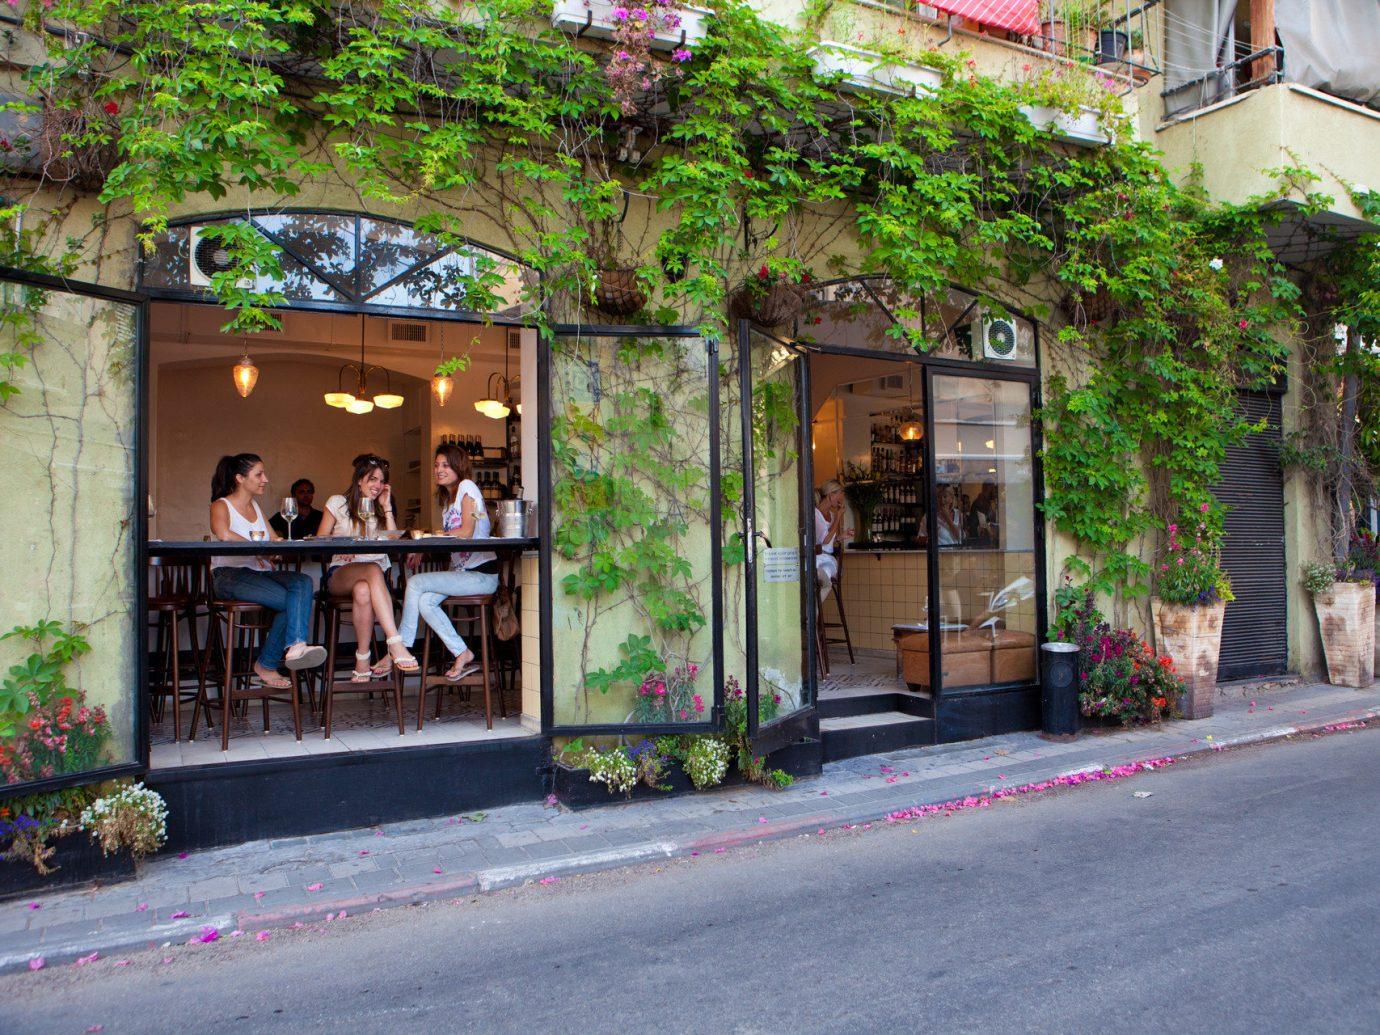 Budget road outdoor street neighbourhood urban area Town way sidewalk restaurant flower